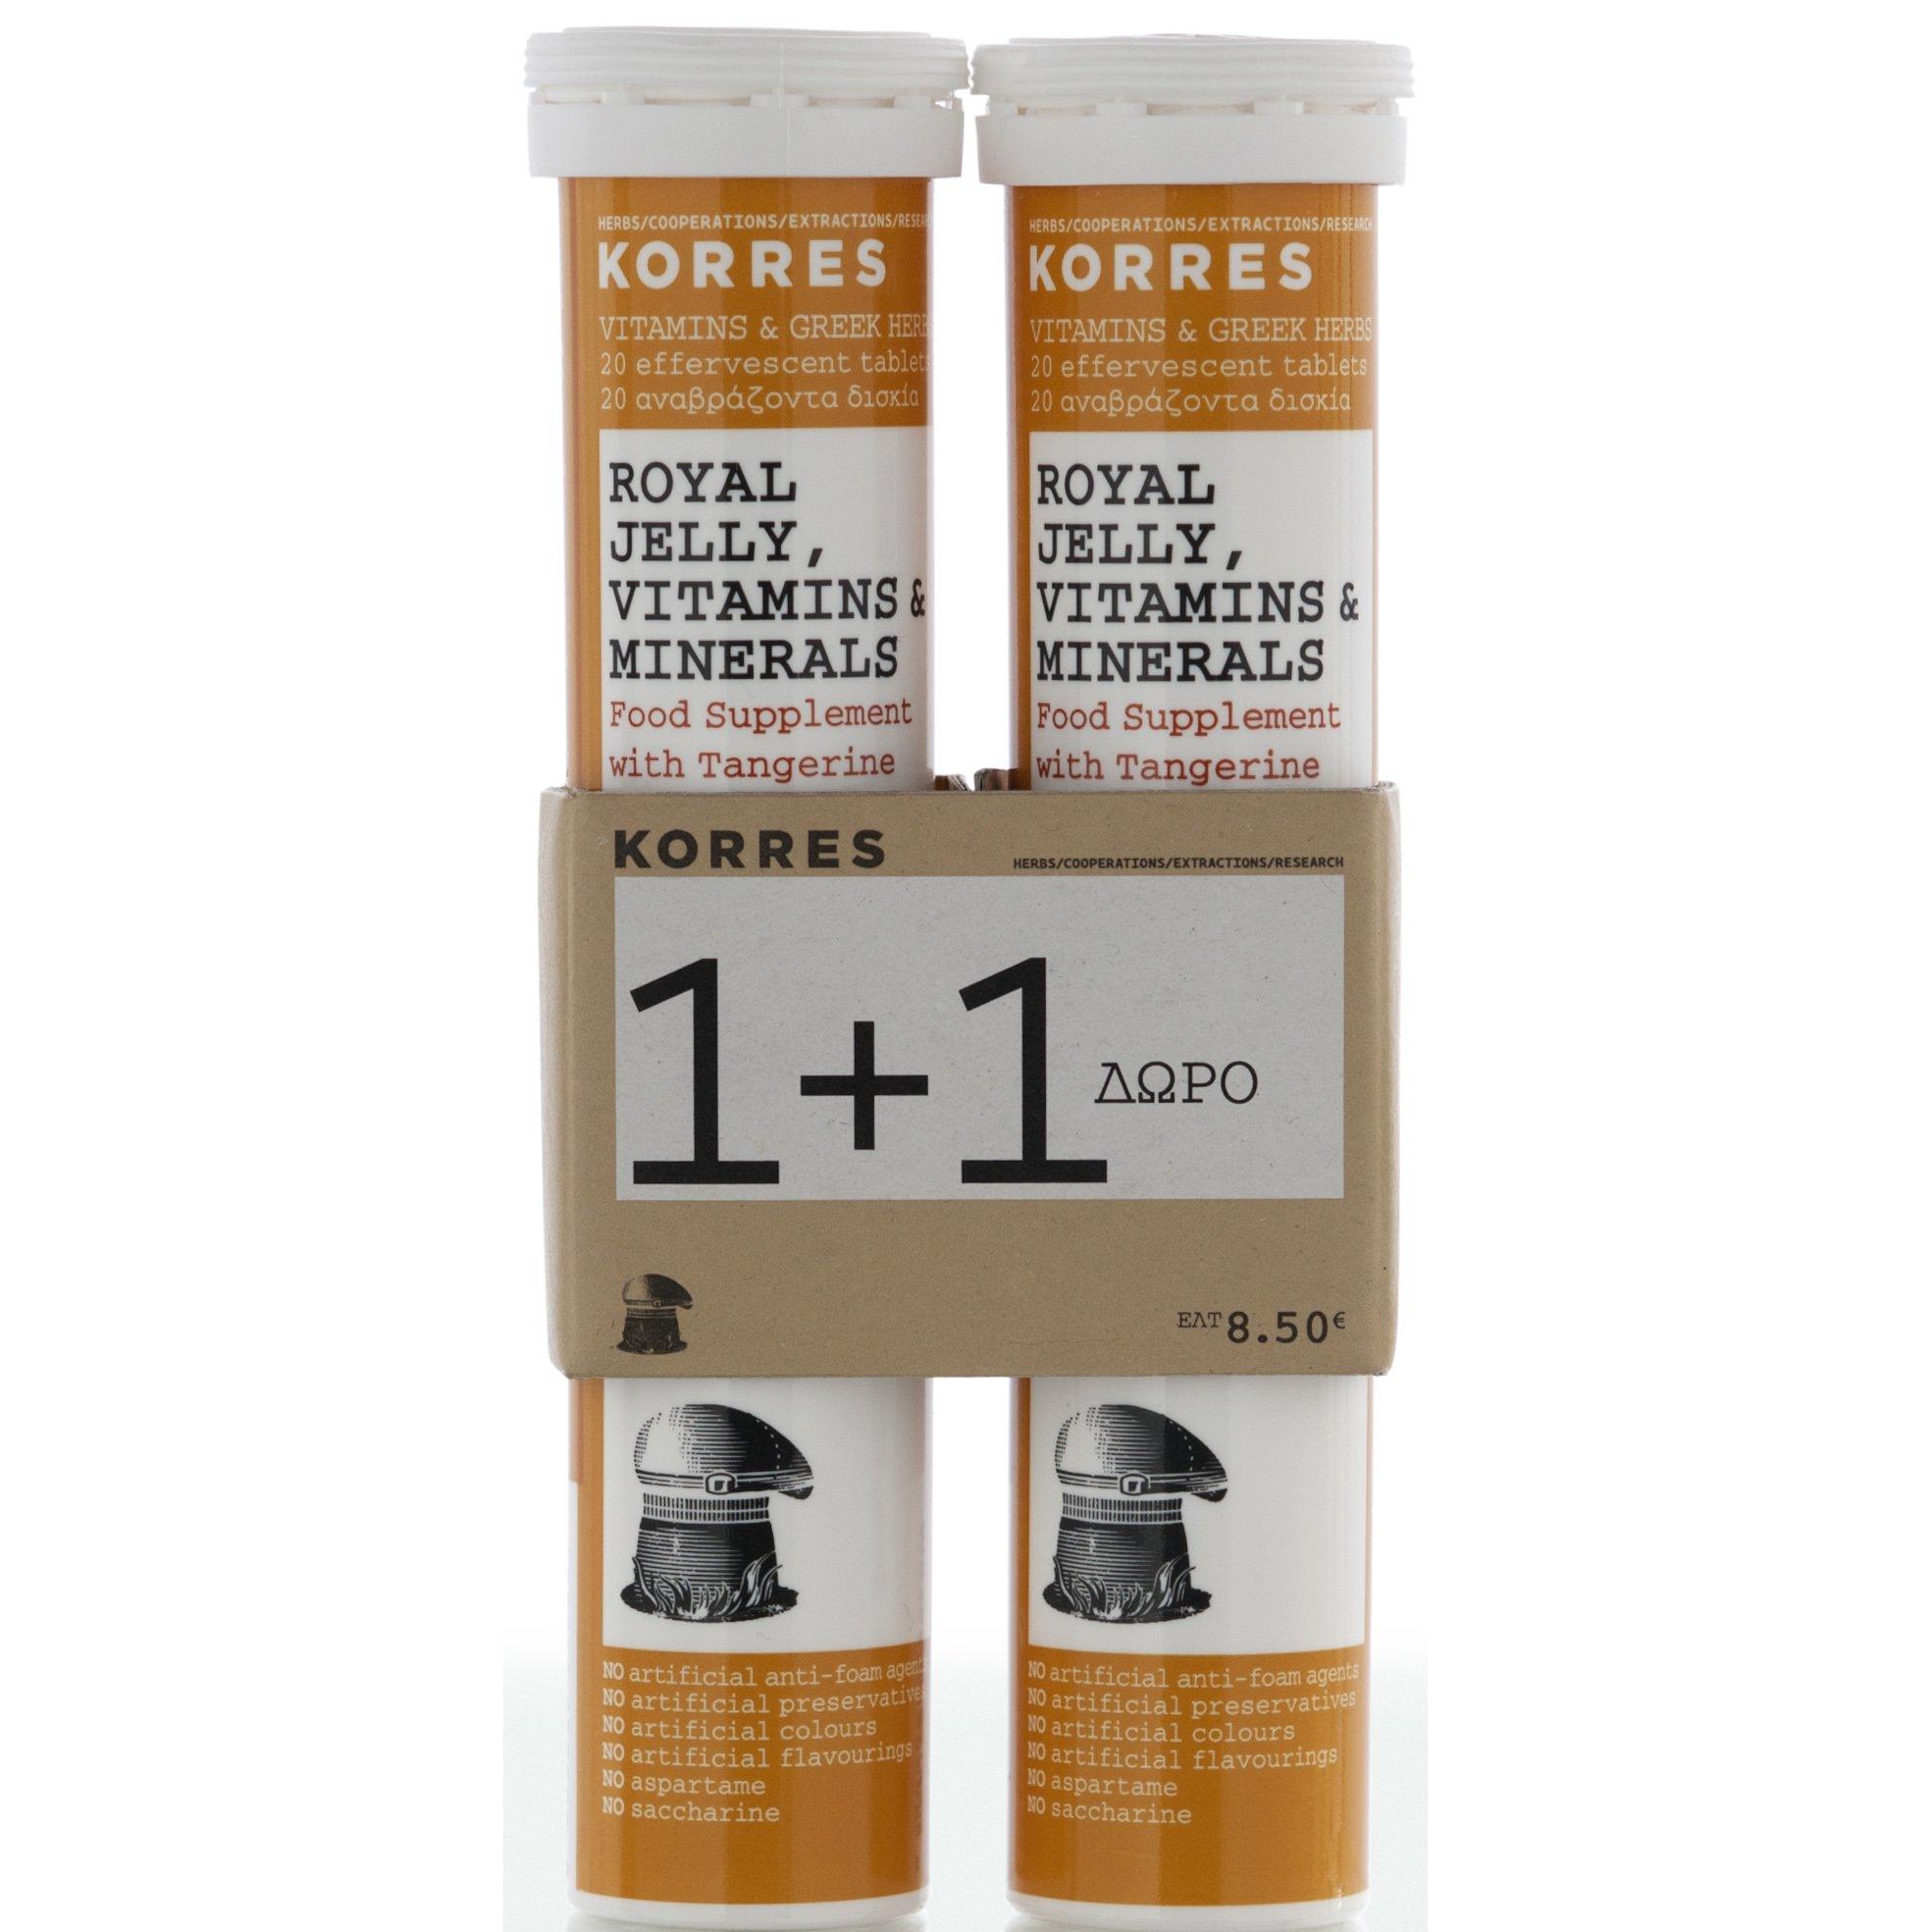 Korres Royal Jelly Βασιλικός Πολτός Βιταμίνες & Μέταλλα 1+1 Δώρο 2x18eff.tabs